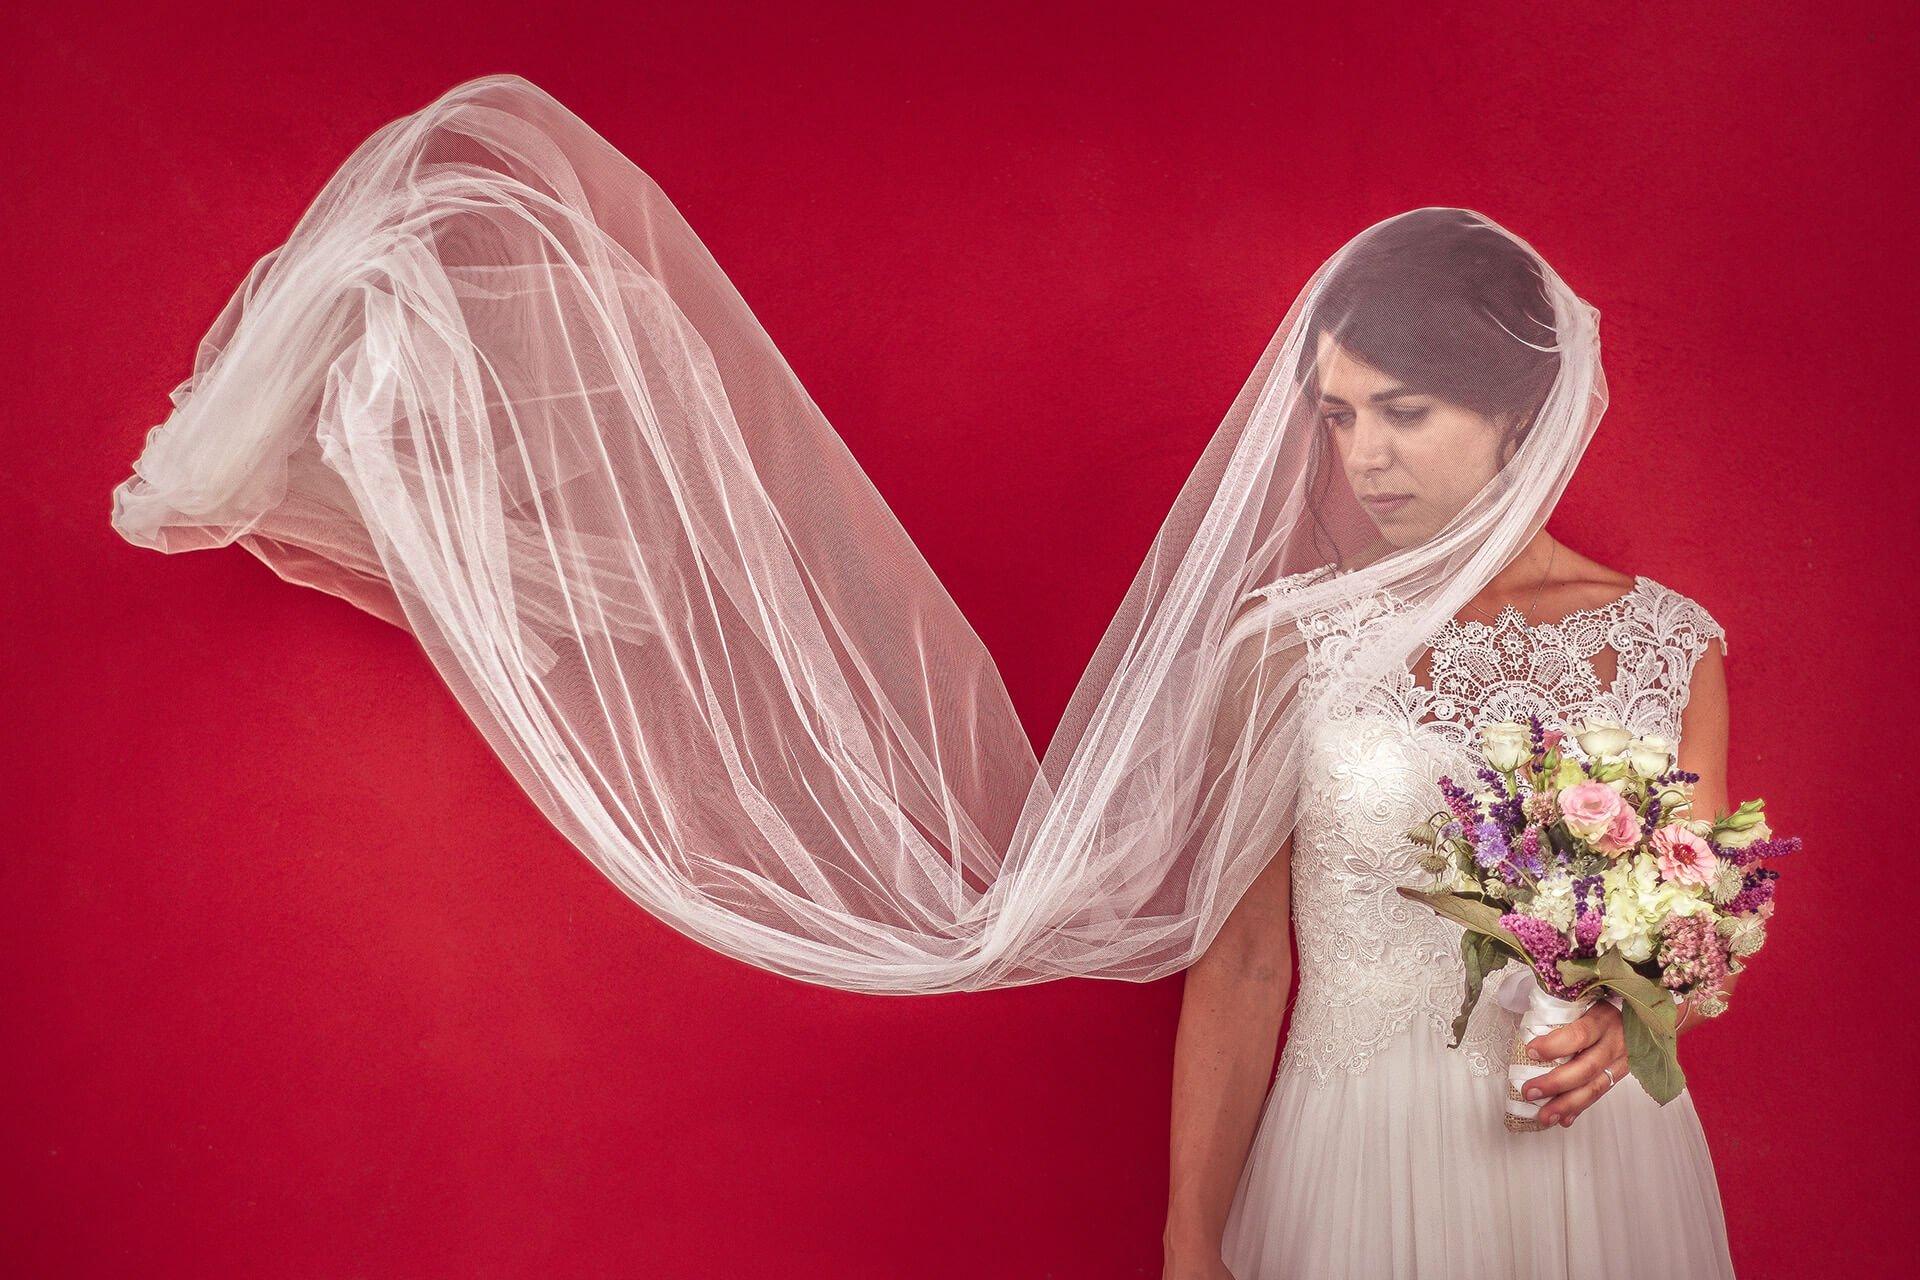 matrimonio sposa velo rosso alain battiloro fotografo